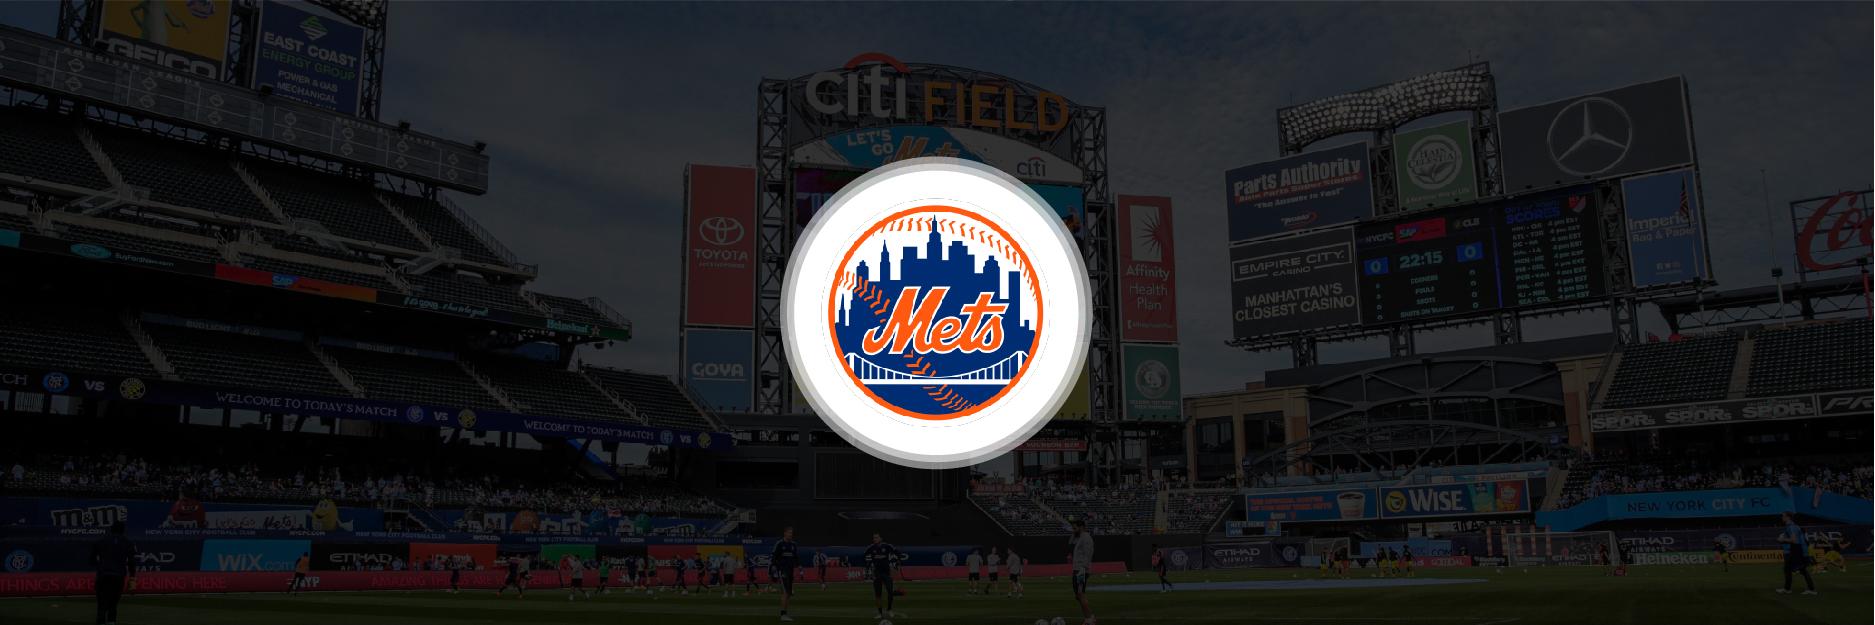 New York Mets 2020 Pre-Season Analysis